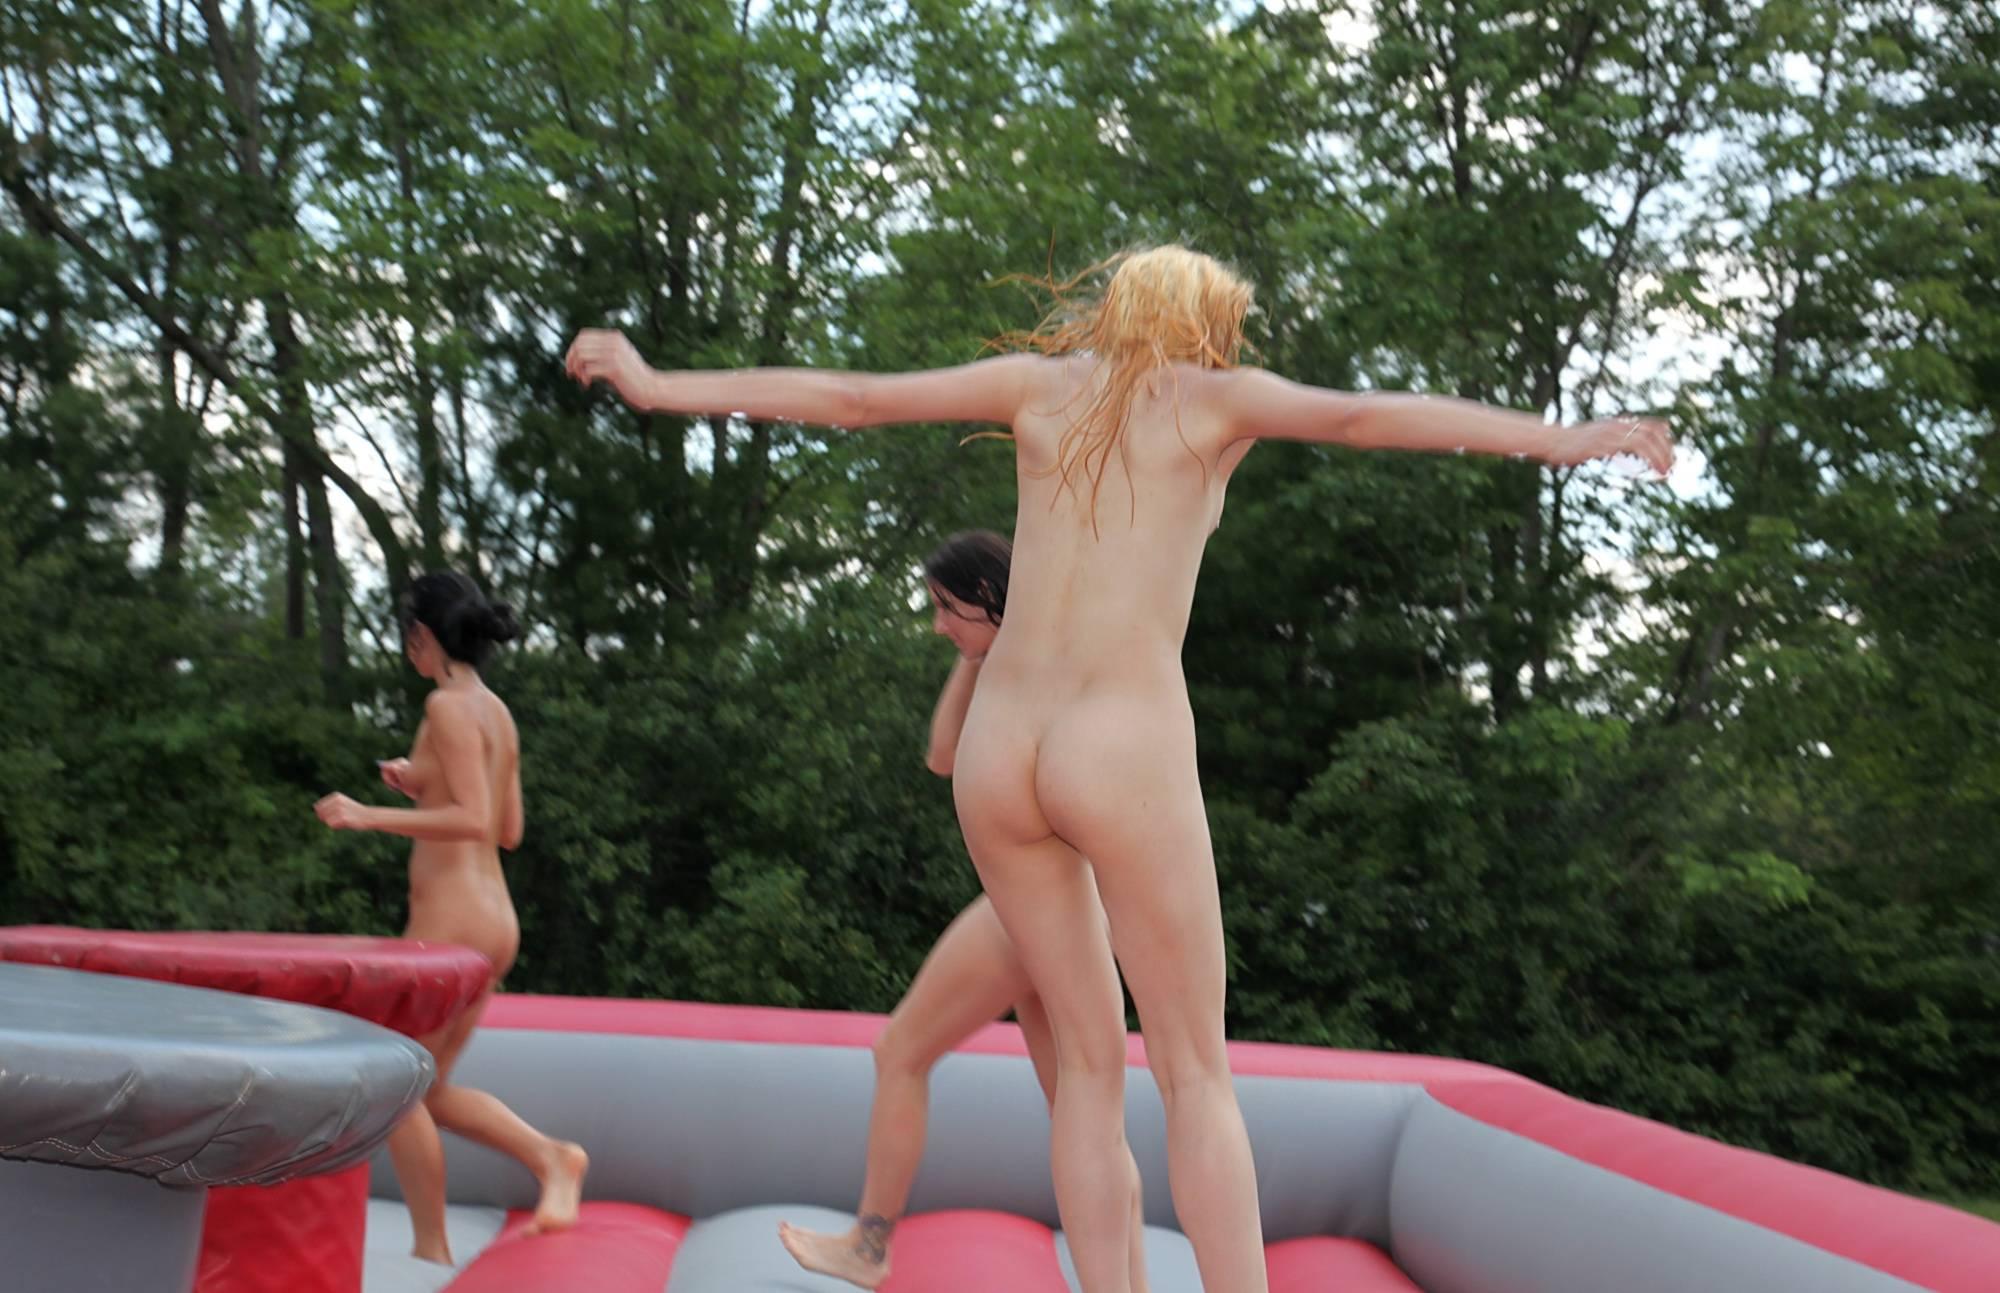 Pure Nudism Gallery Bouncy Arena Acrobats - 1